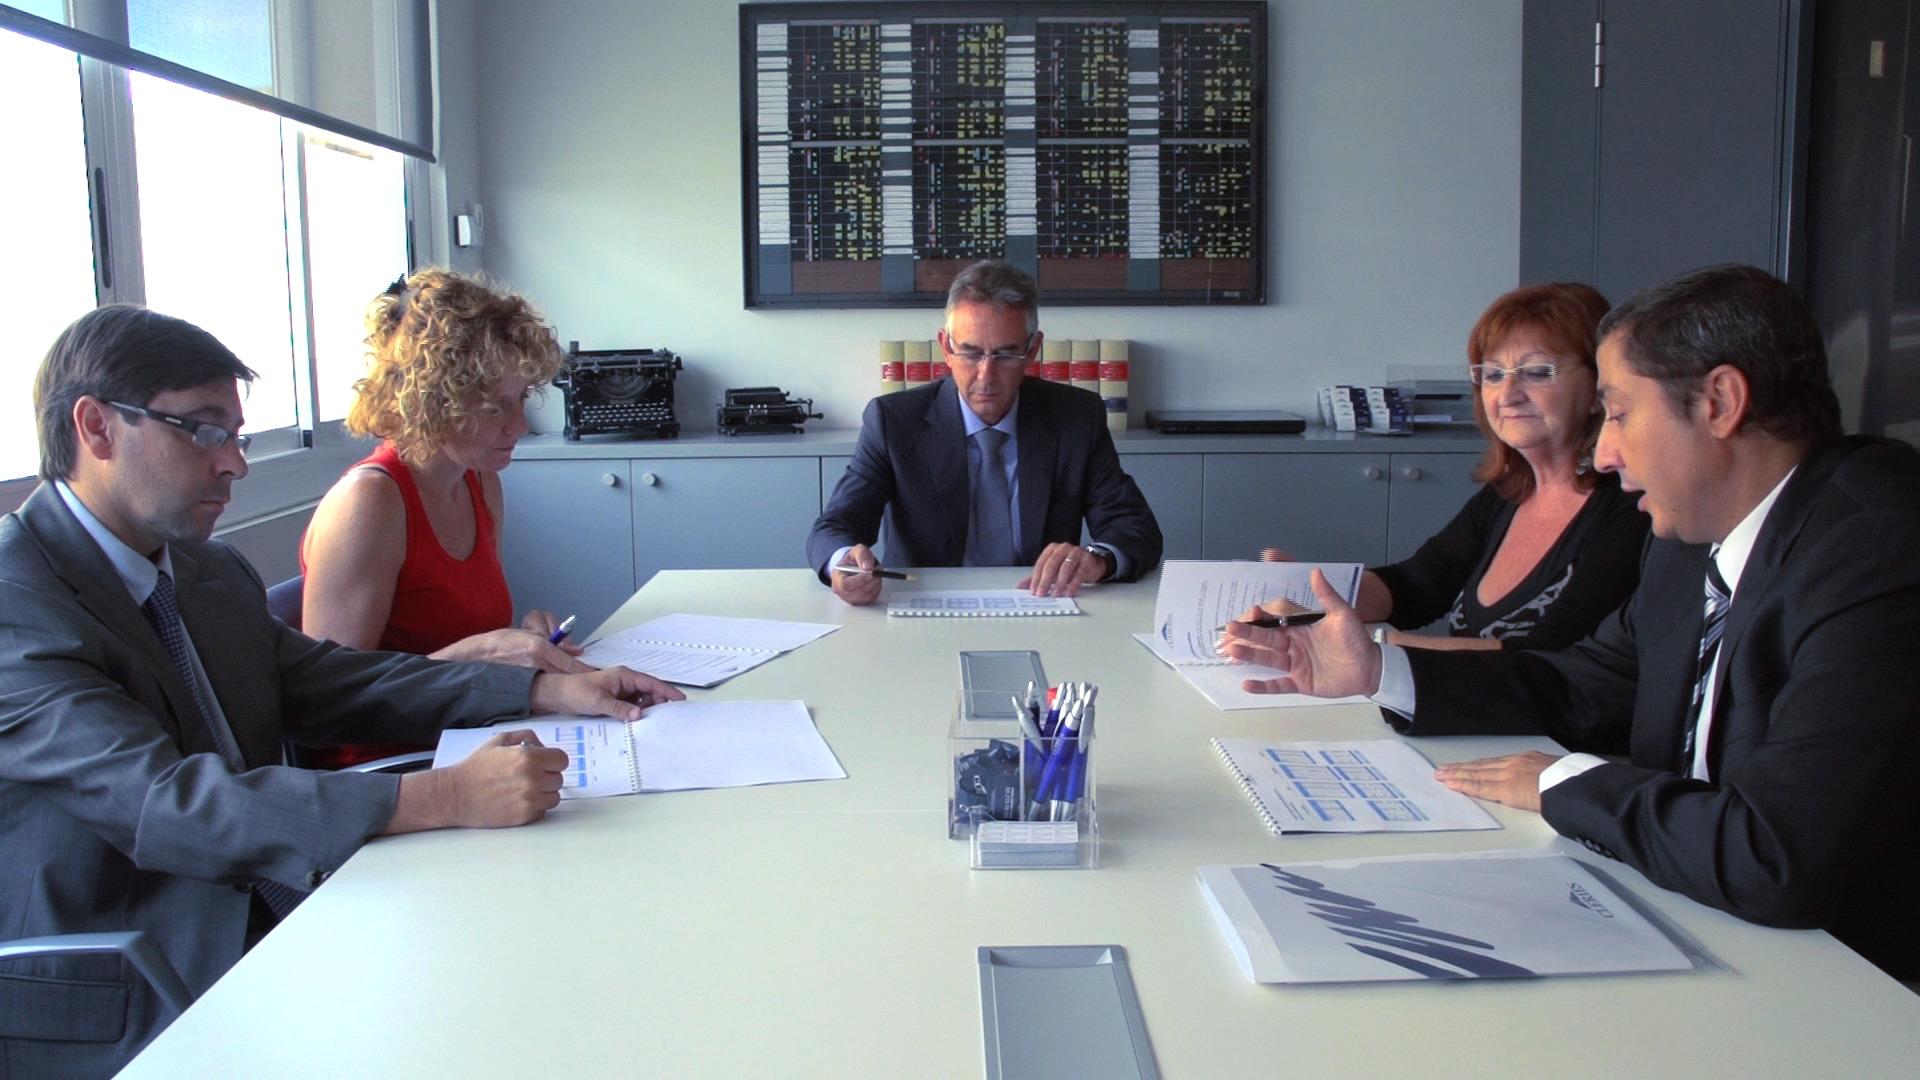 Cleries administraci n de fincas asesoria inmobiliaria en barcelona plenummedia v deo - Administradores de fincas de barcelona ...